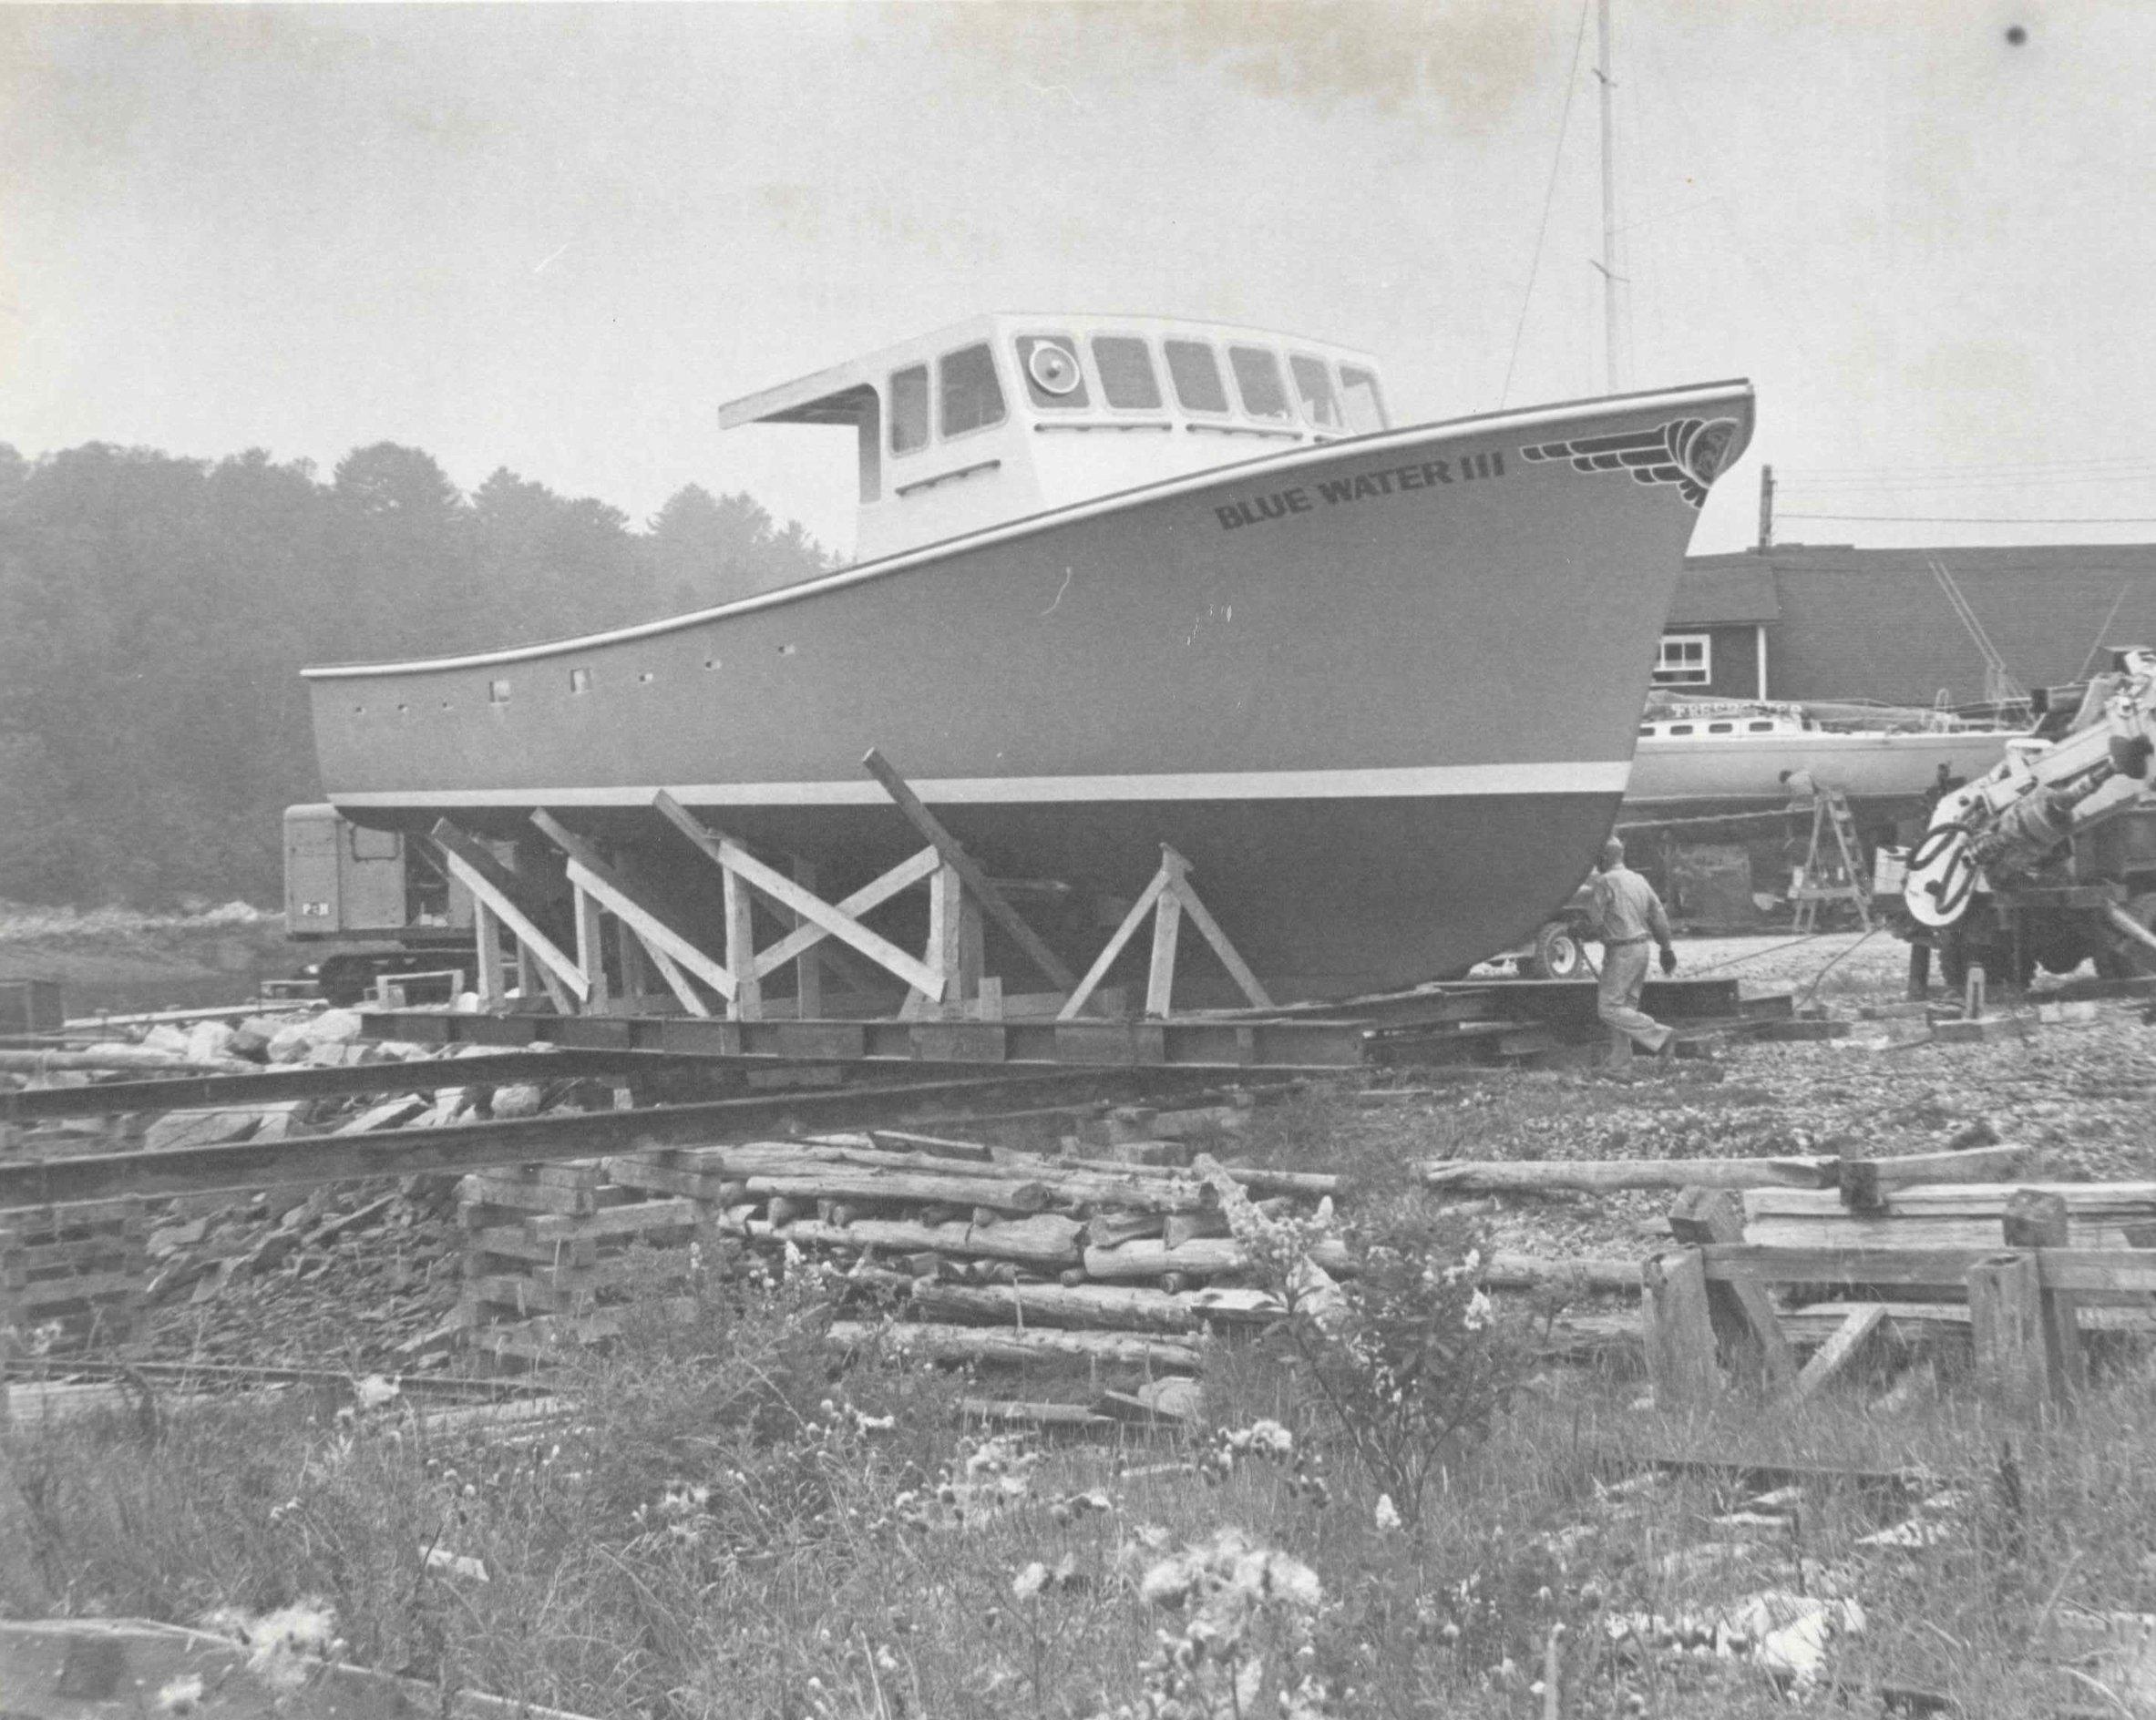 Blue Water III. Webber's Cove Boatyards. Blue Hill, Maine.